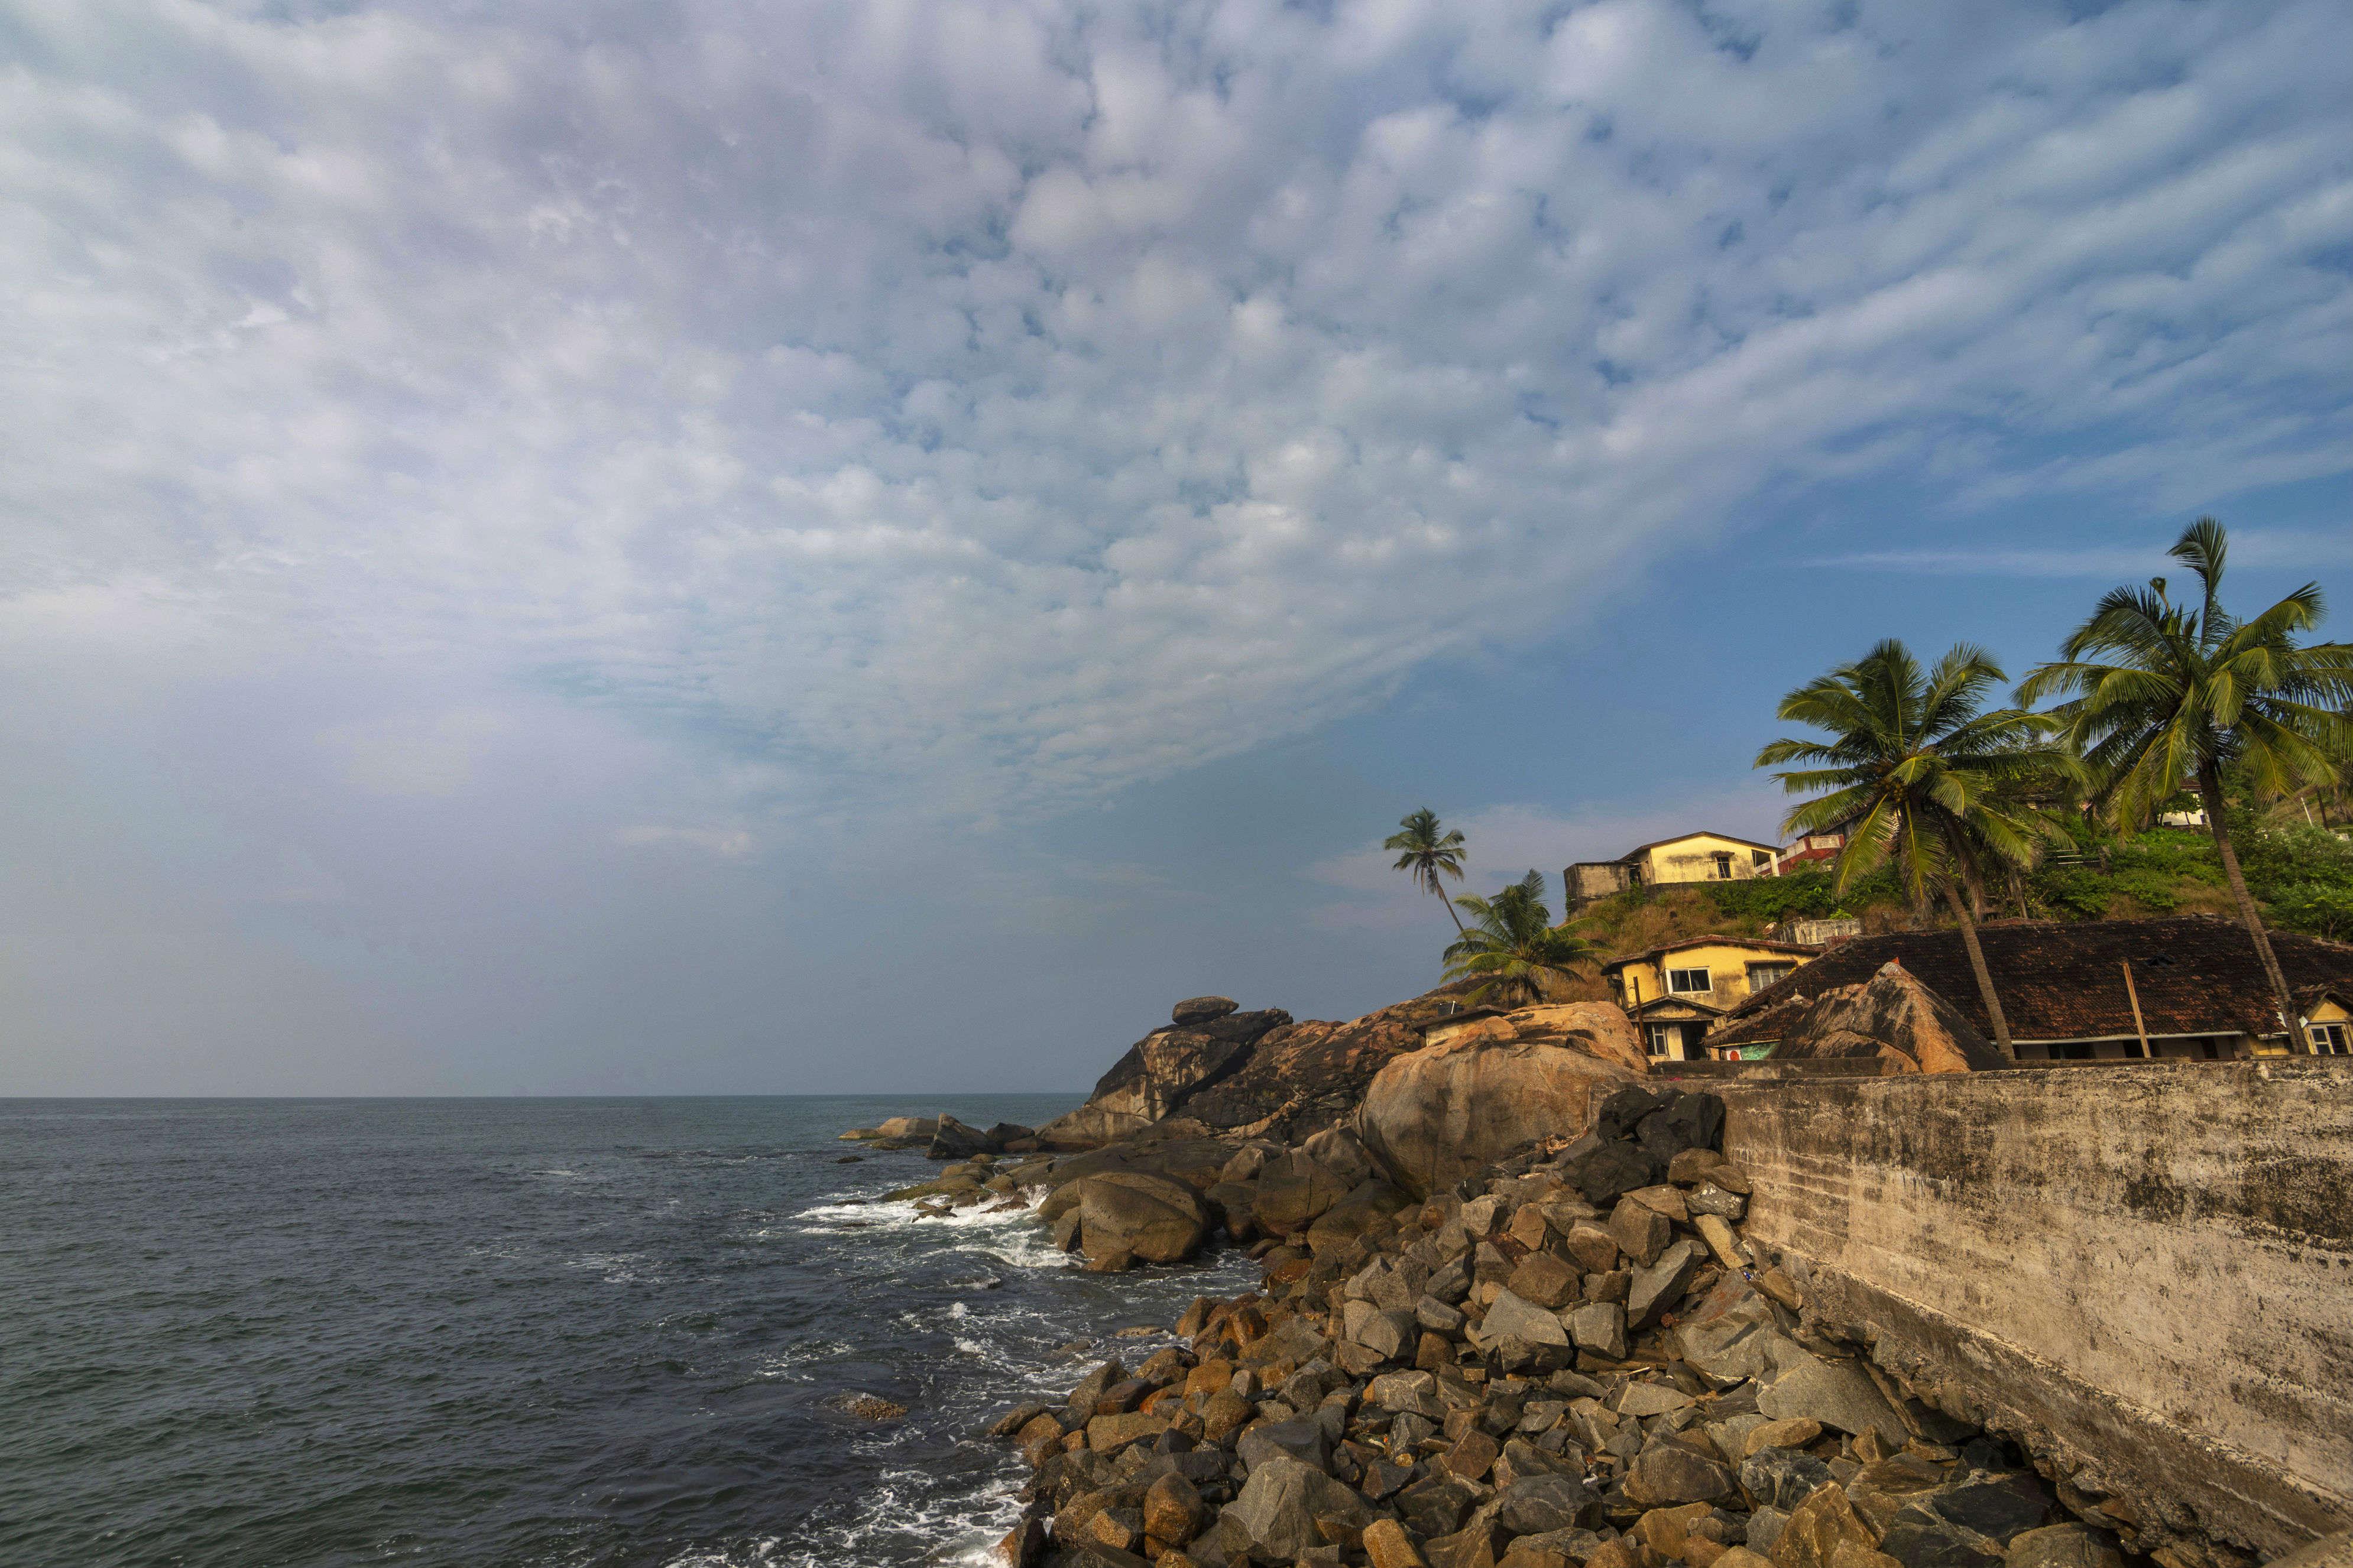 Maharashtra Tourism to improve its resorts to attract more tourists